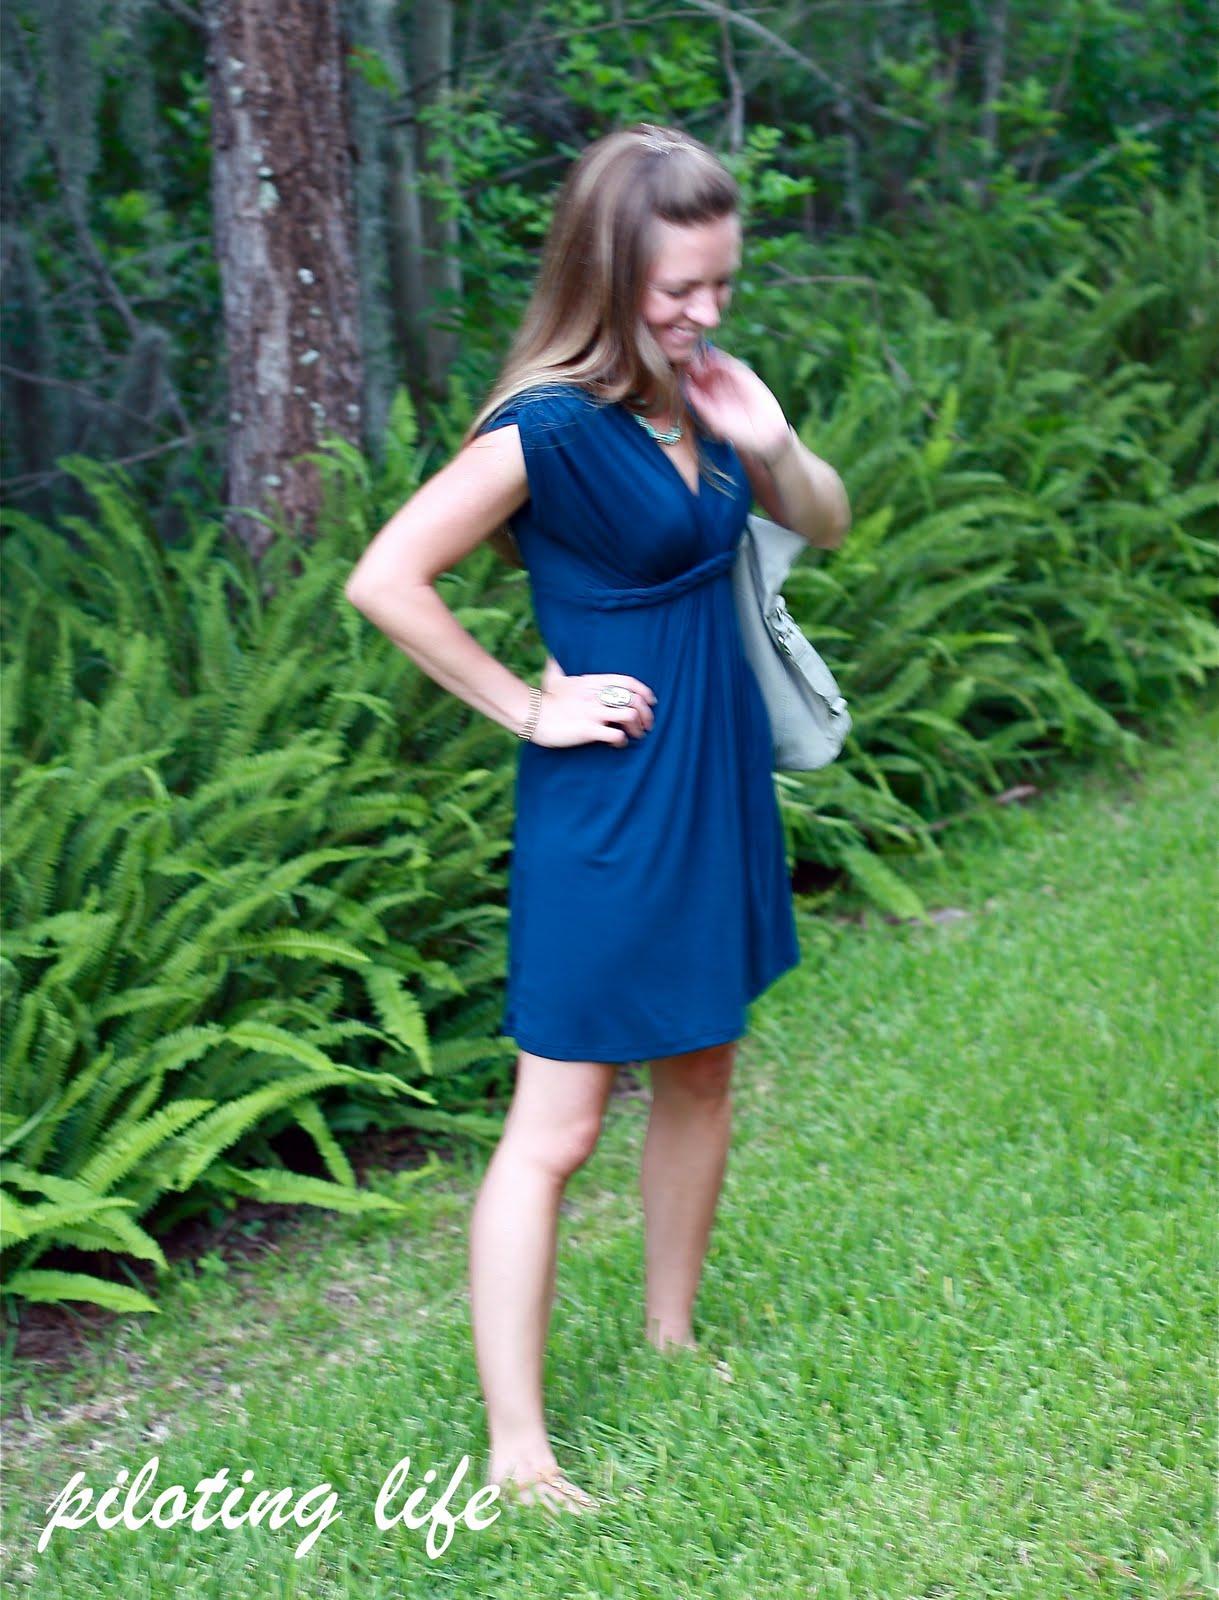 Dress my Babe 5 walkthrough and secrets - Digg